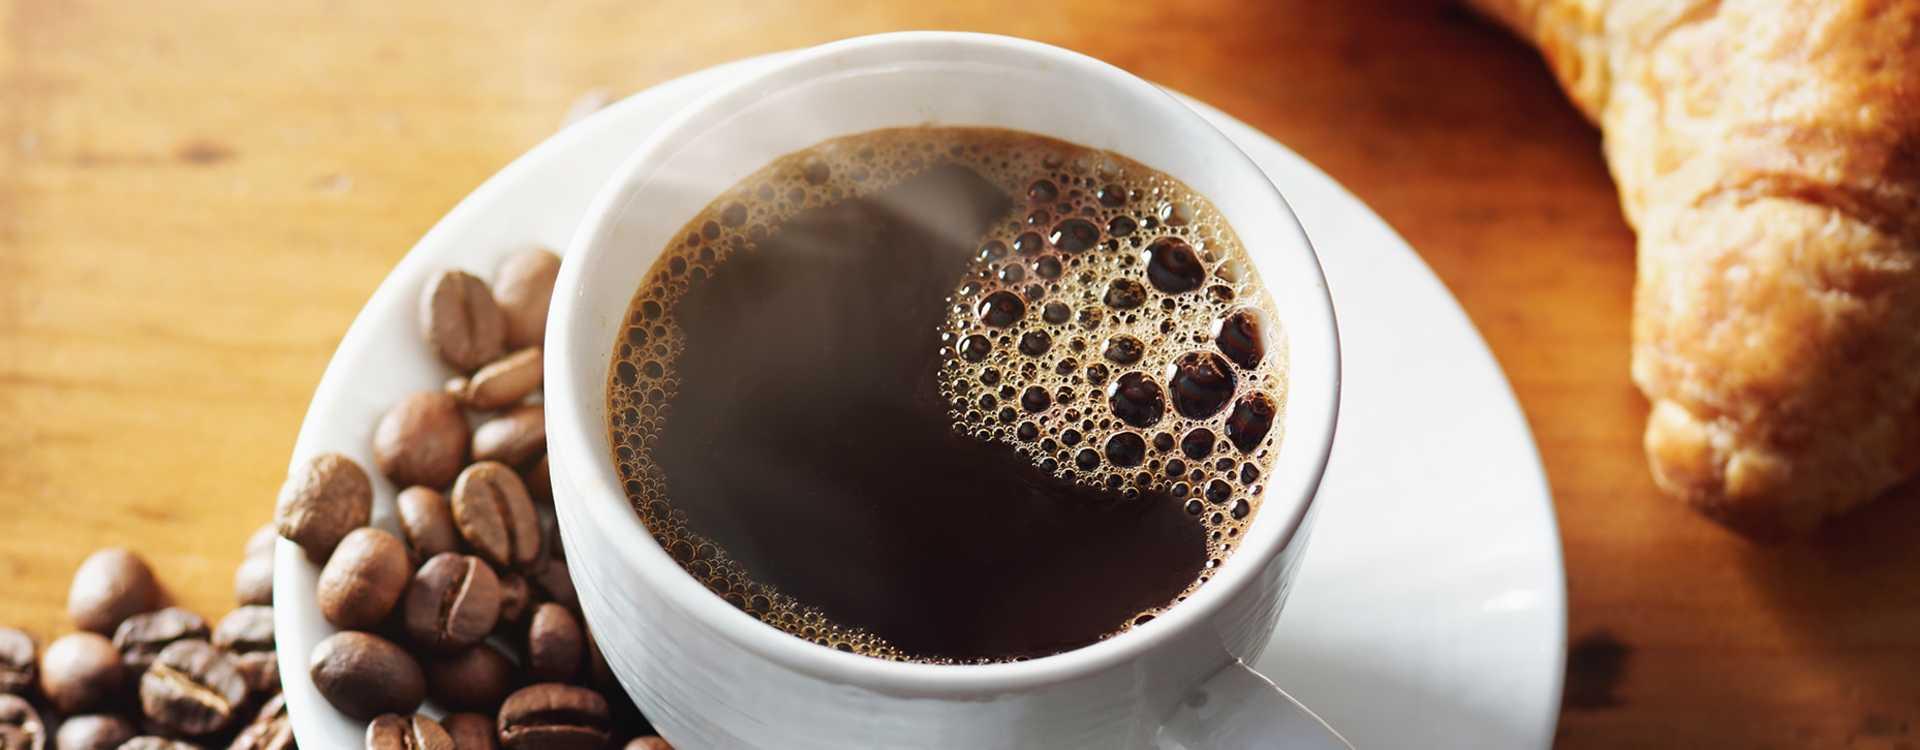 KONA KAI COFFEE Tukwila, WA